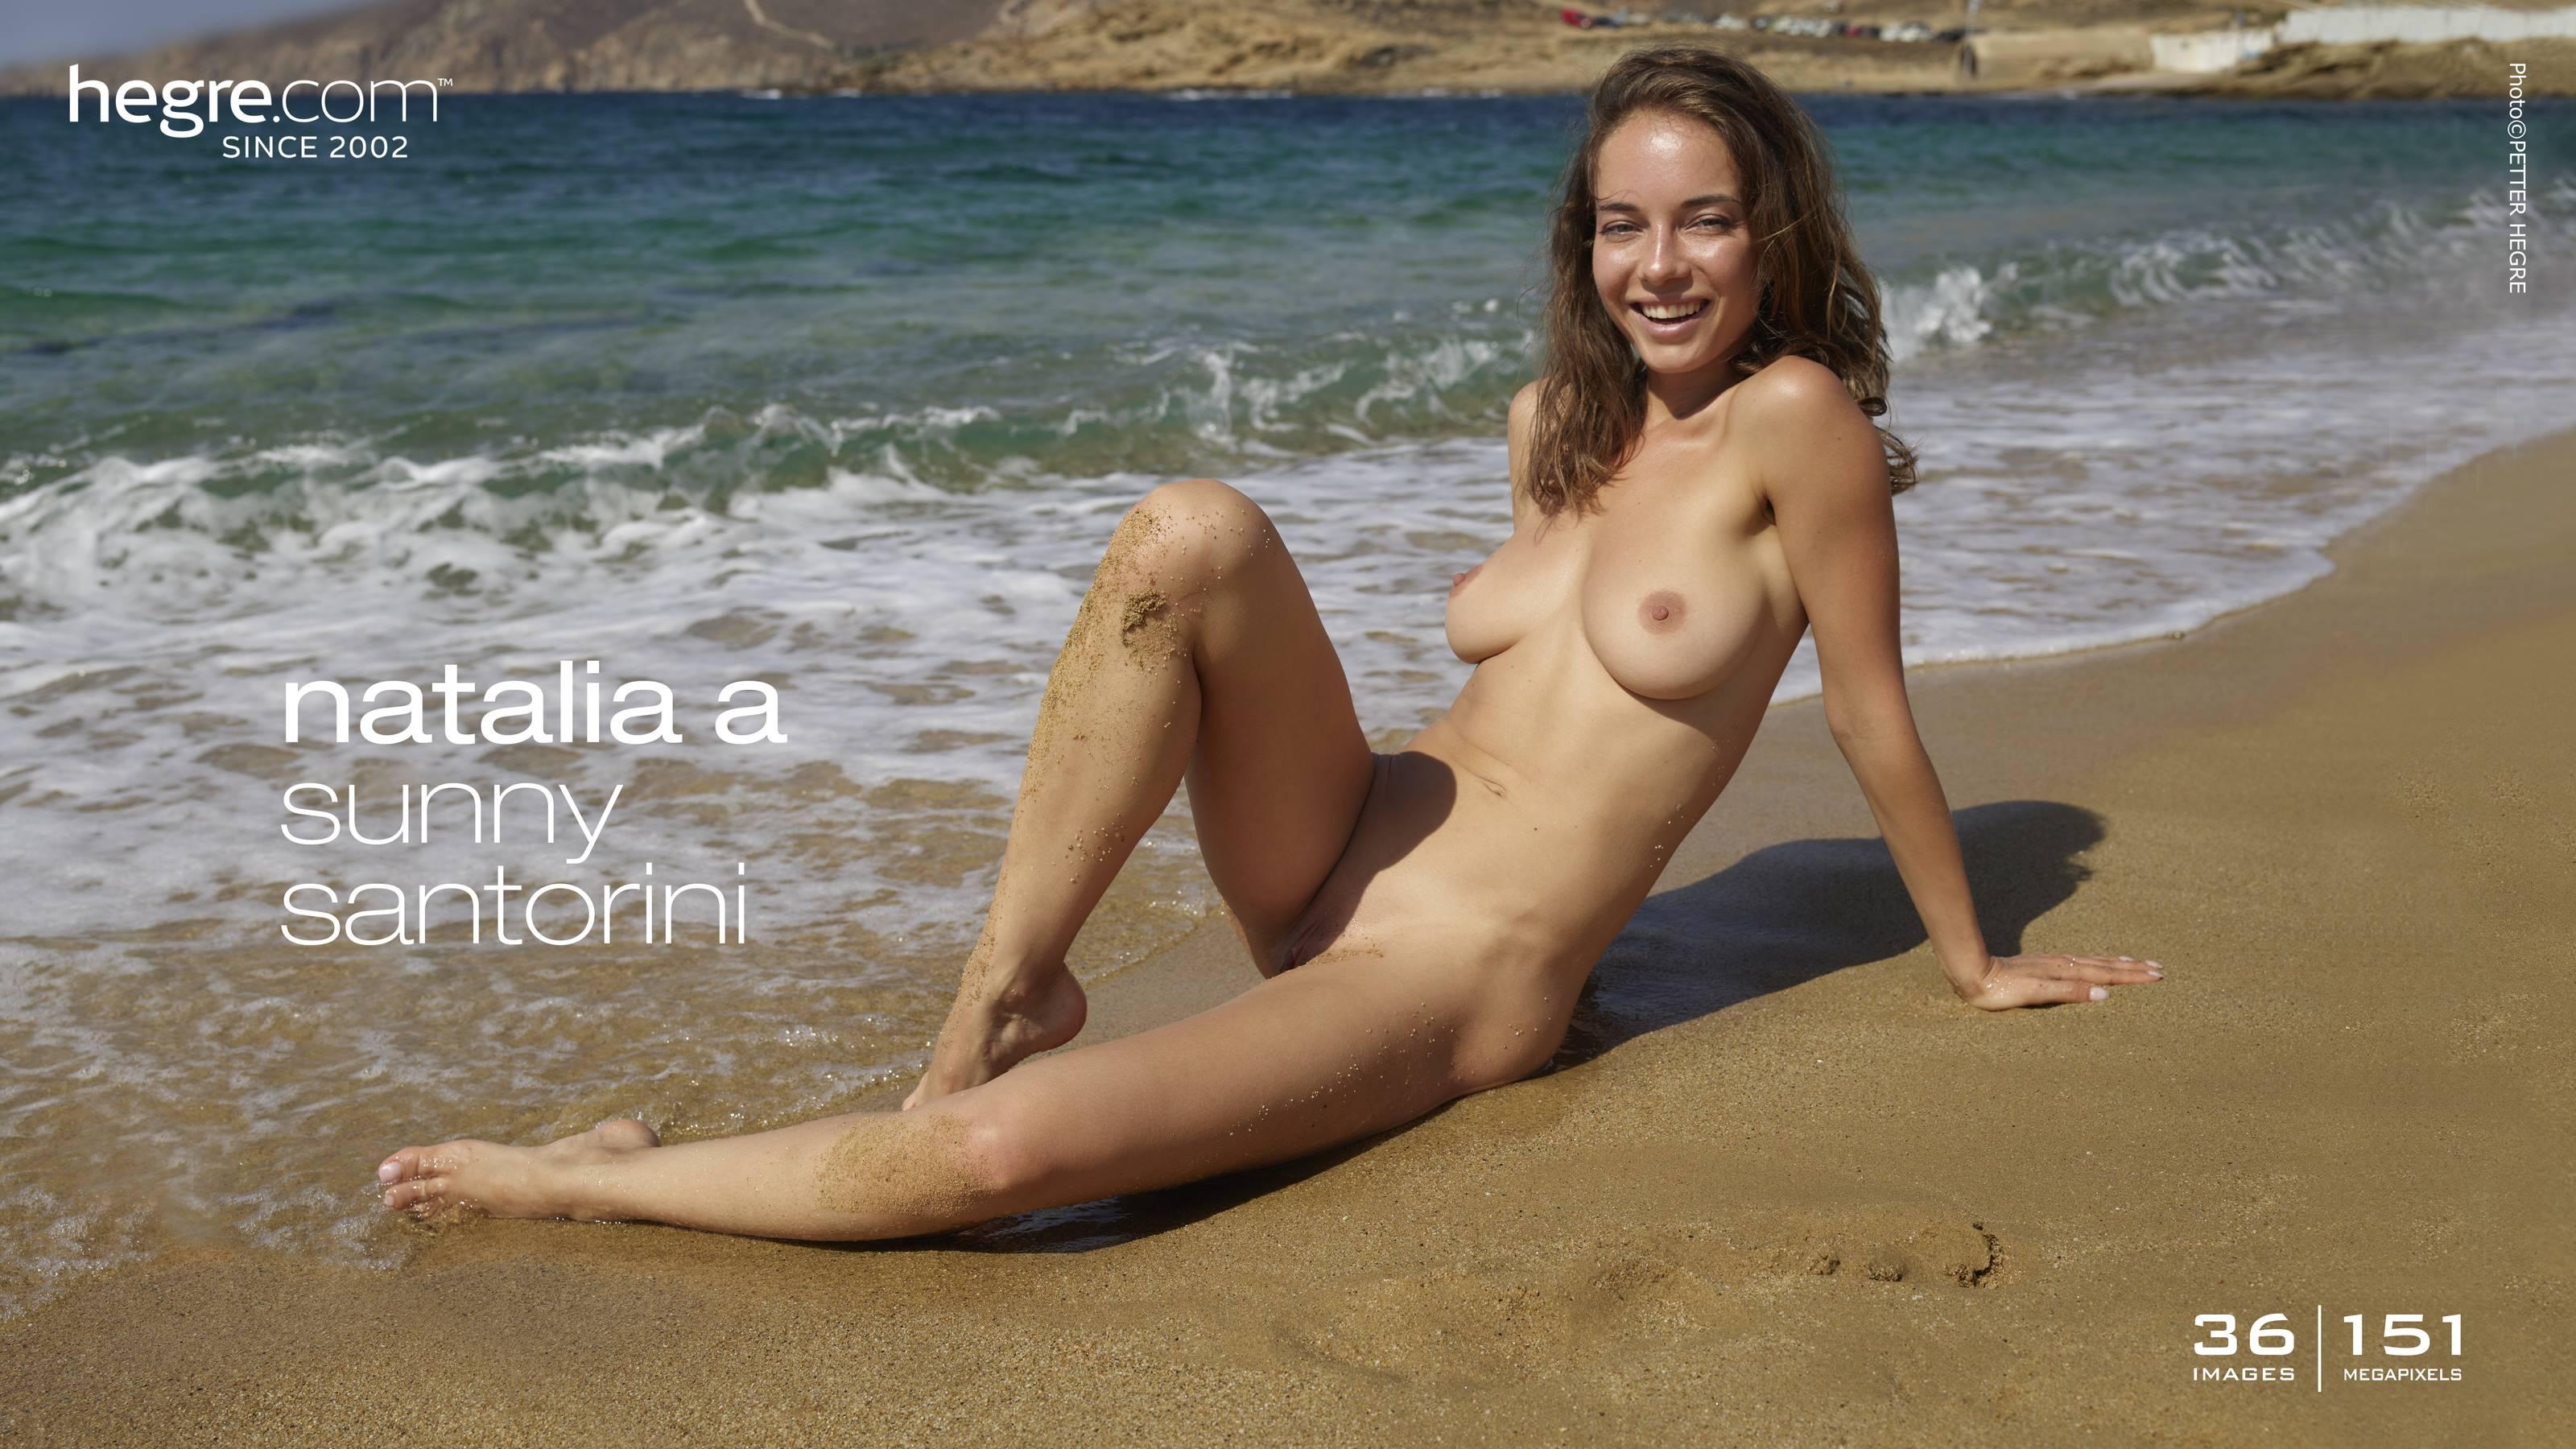 natalia-a-sunny-santorini-board.jpg